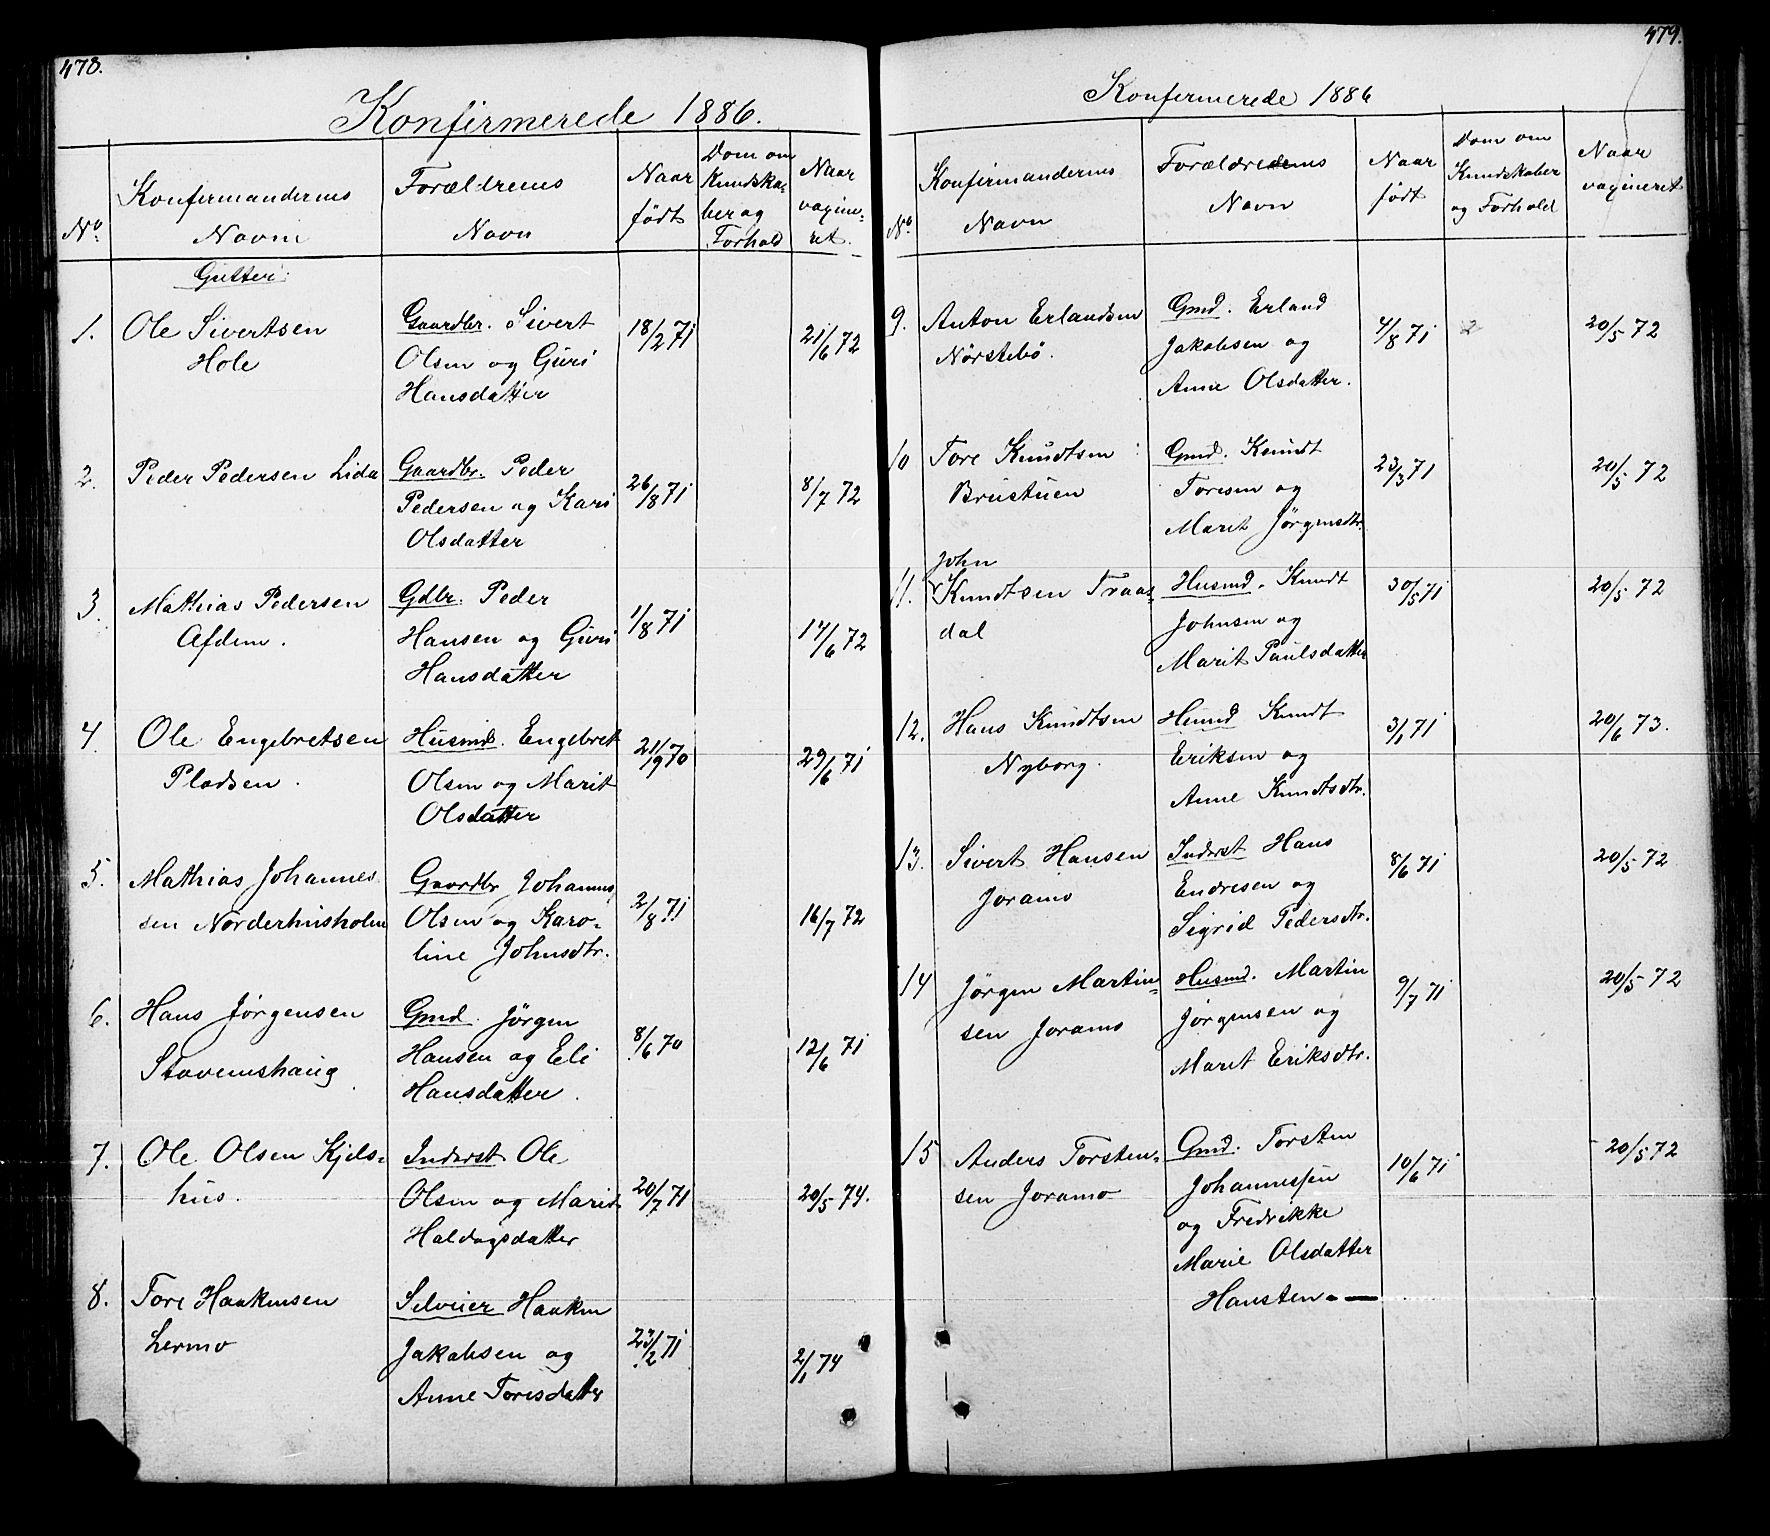 SAH, Lesja prestekontor, Klokkerbok nr. 5, 1850-1894, s. 478-479